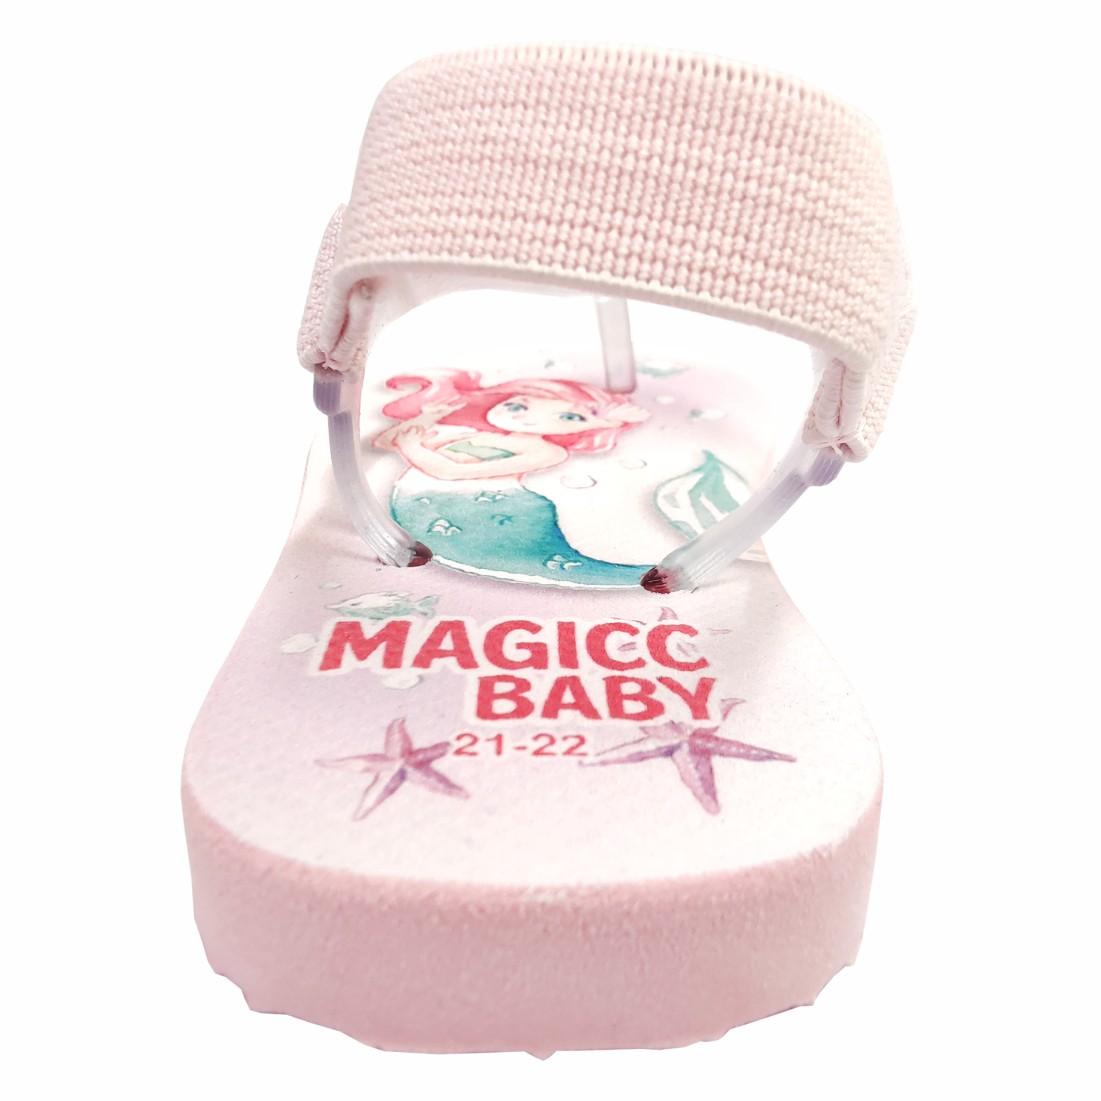 Chinelo Bebê Sandália Infantil Sereia Meninas Magicc Baby